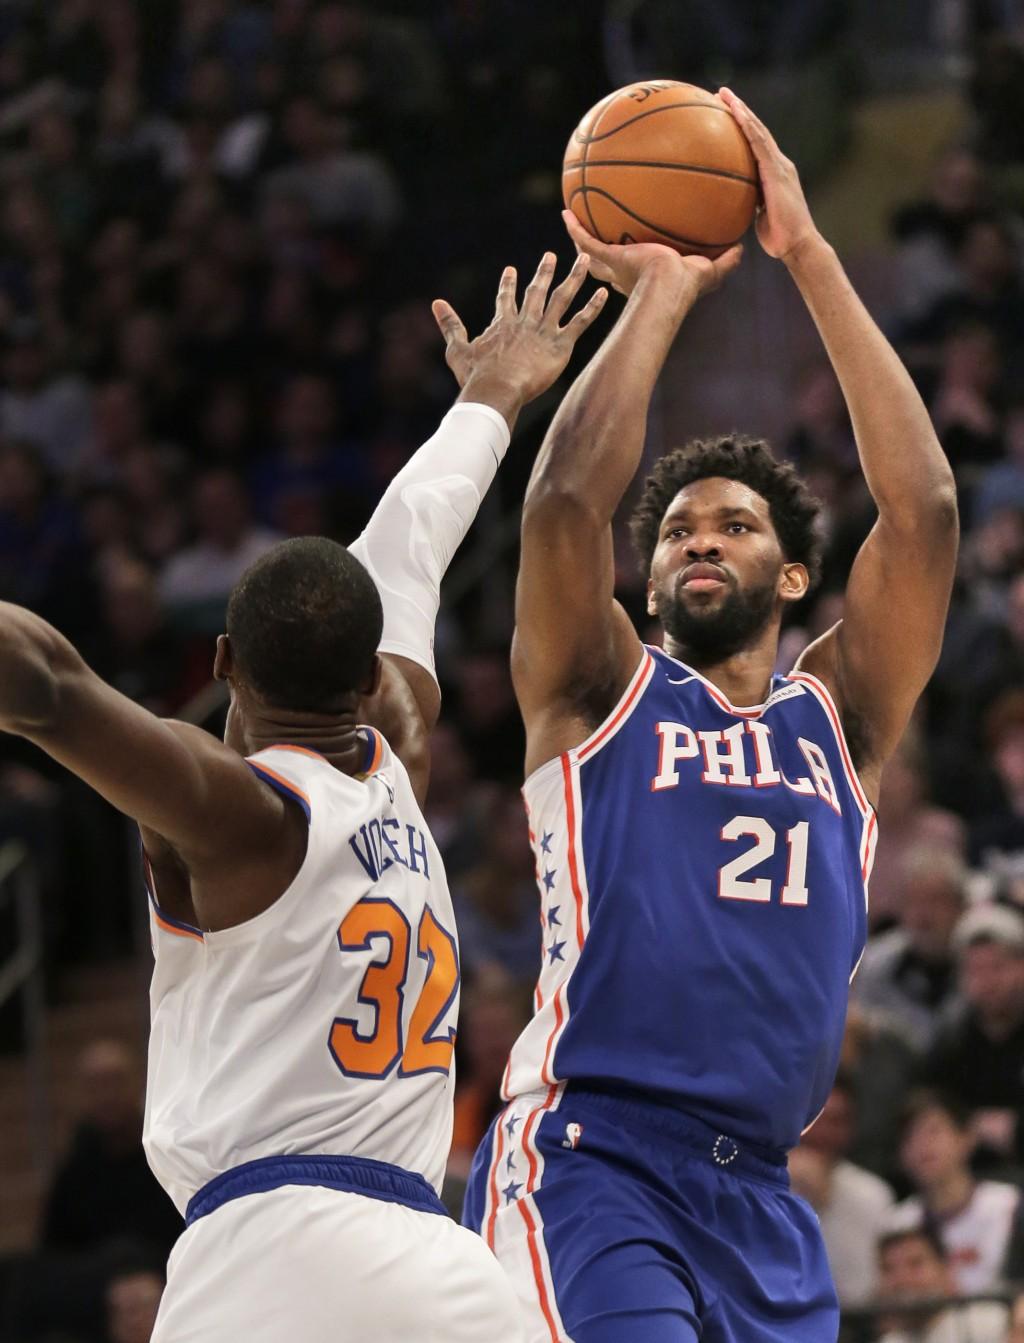 Philadelphia 76ers' Joel Embiid, right, shoots over New York Knicks' Noah Vonleh during the first half of an NBA basketball game, Sunday, Jan. 13, 201